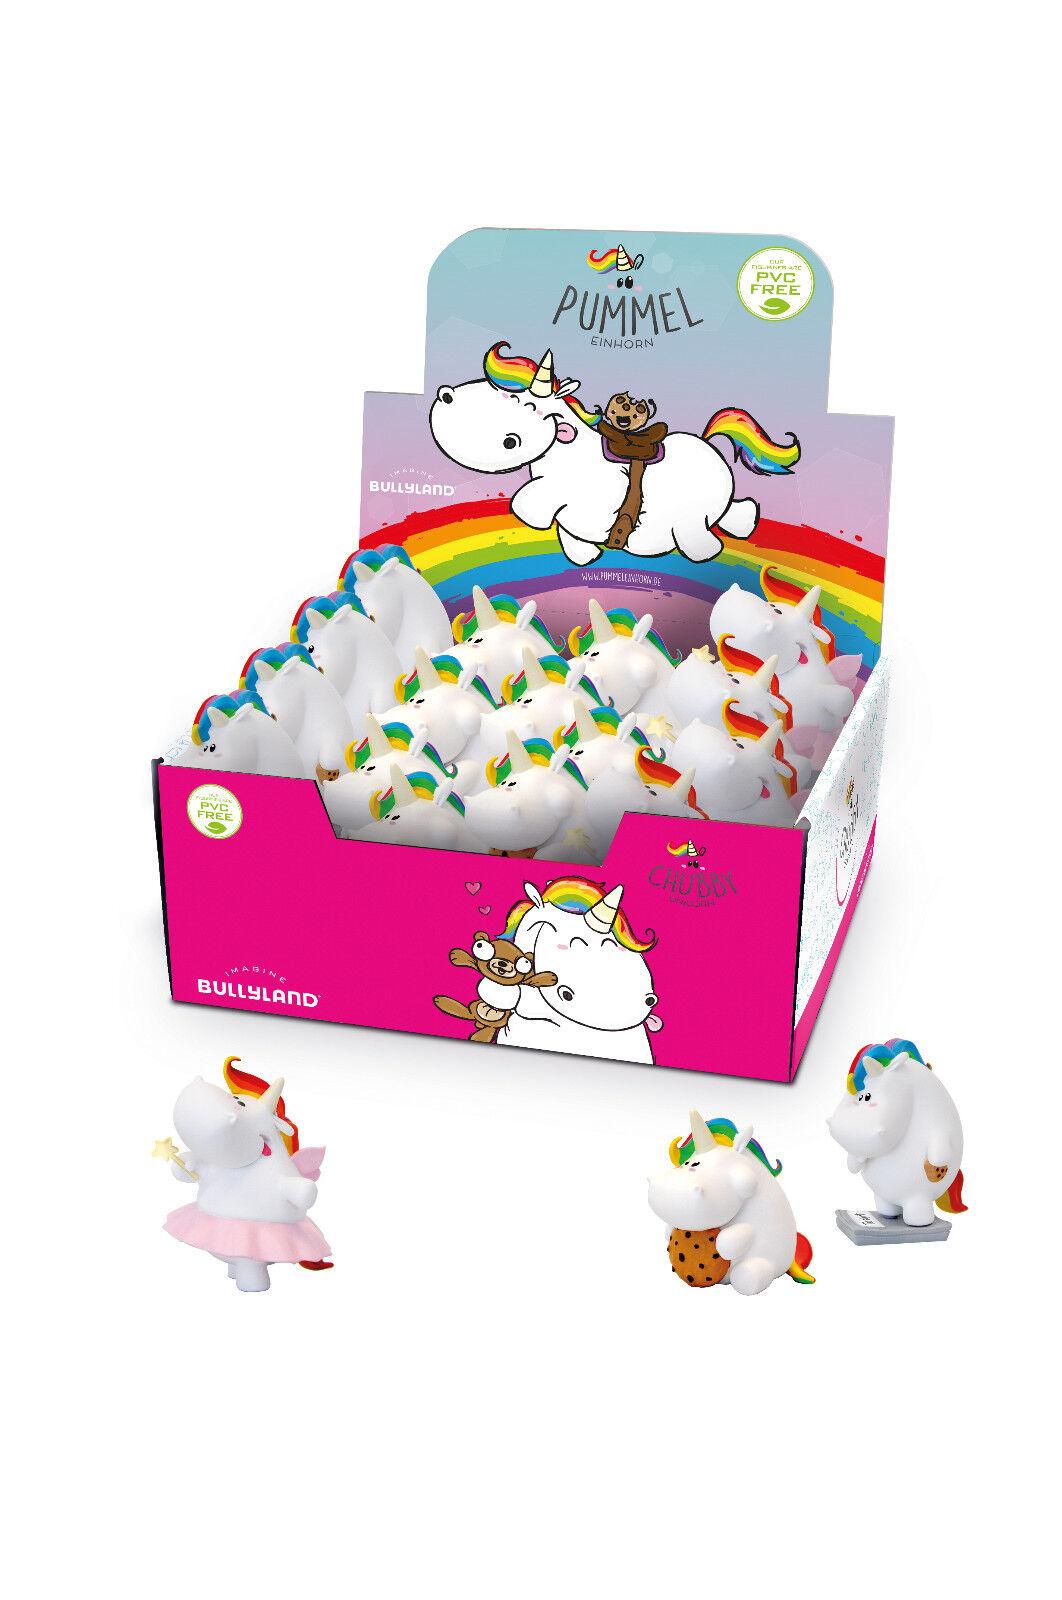 Bullyland Pummeleinhorn  24iger Display 44395 Spielzeug by Brand Toys